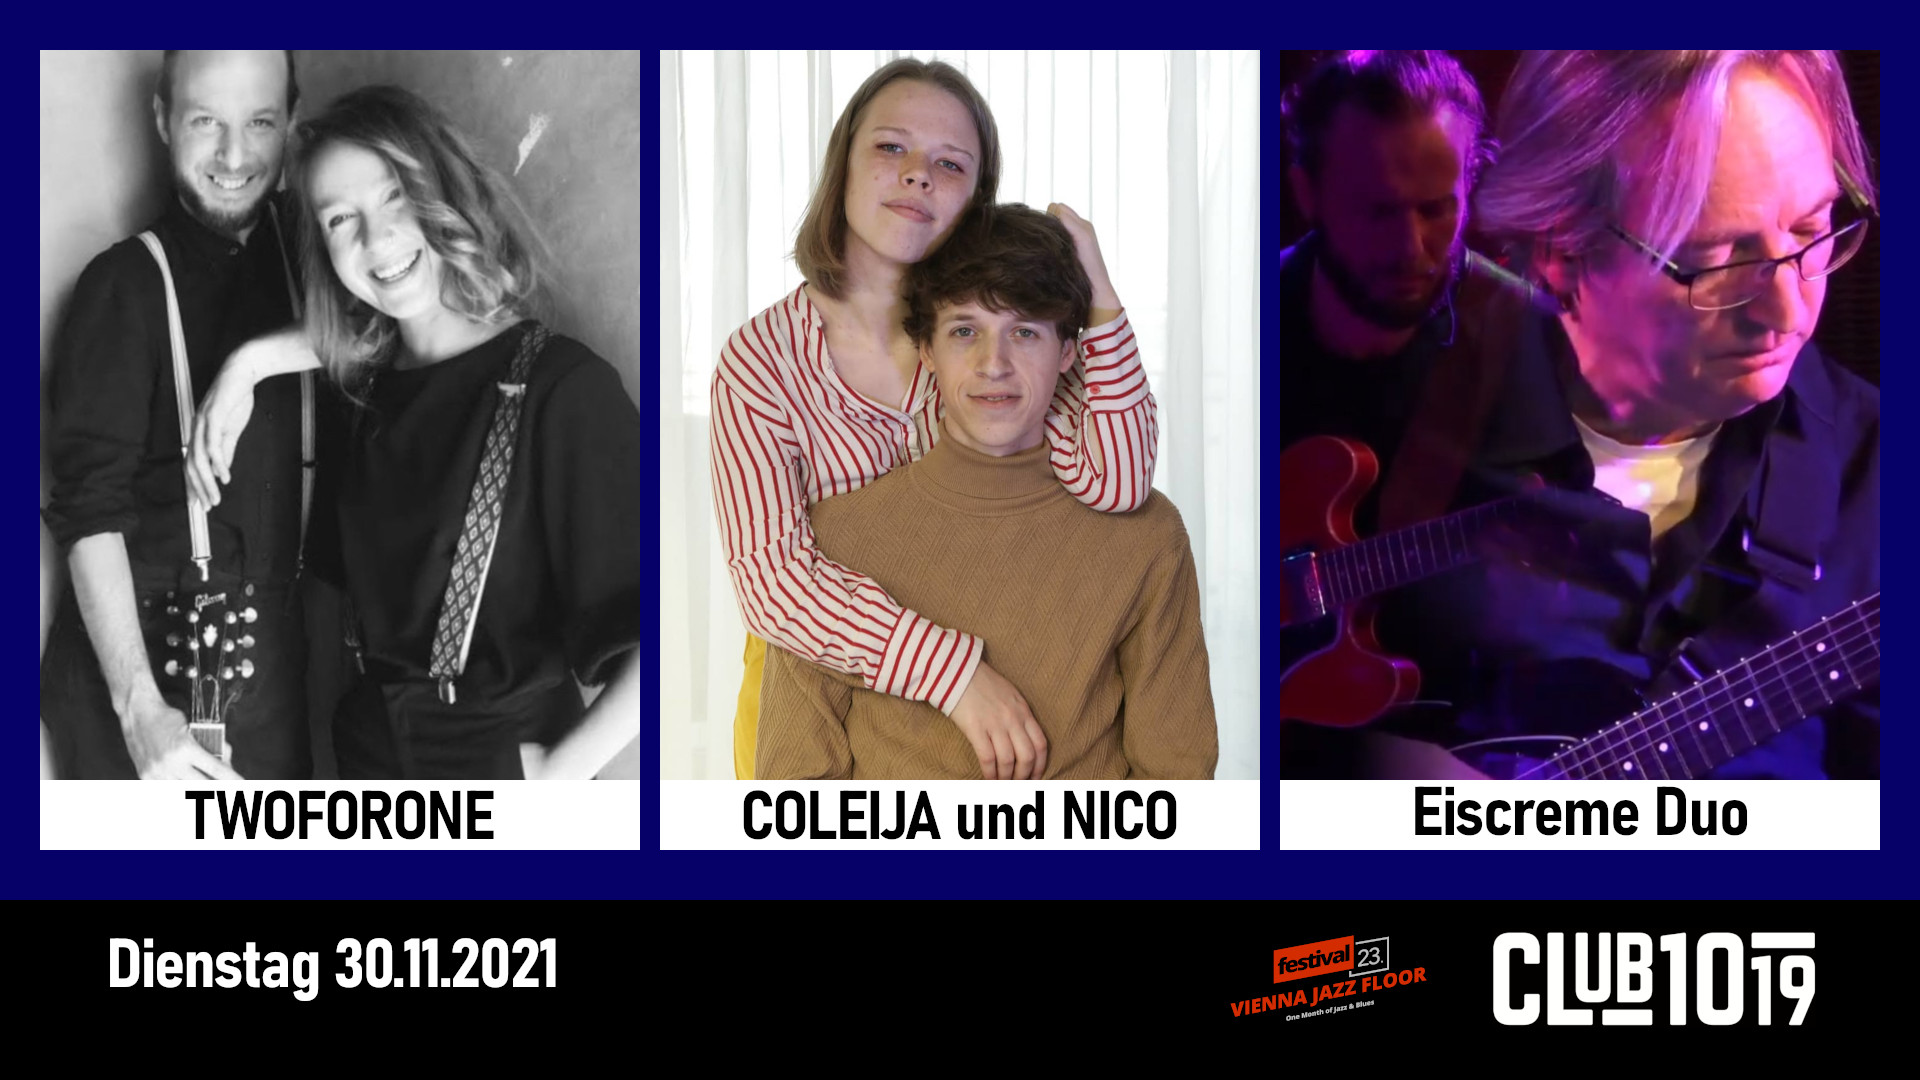 TwoForOne + Coleija und Nico + Eiscreme-Duo